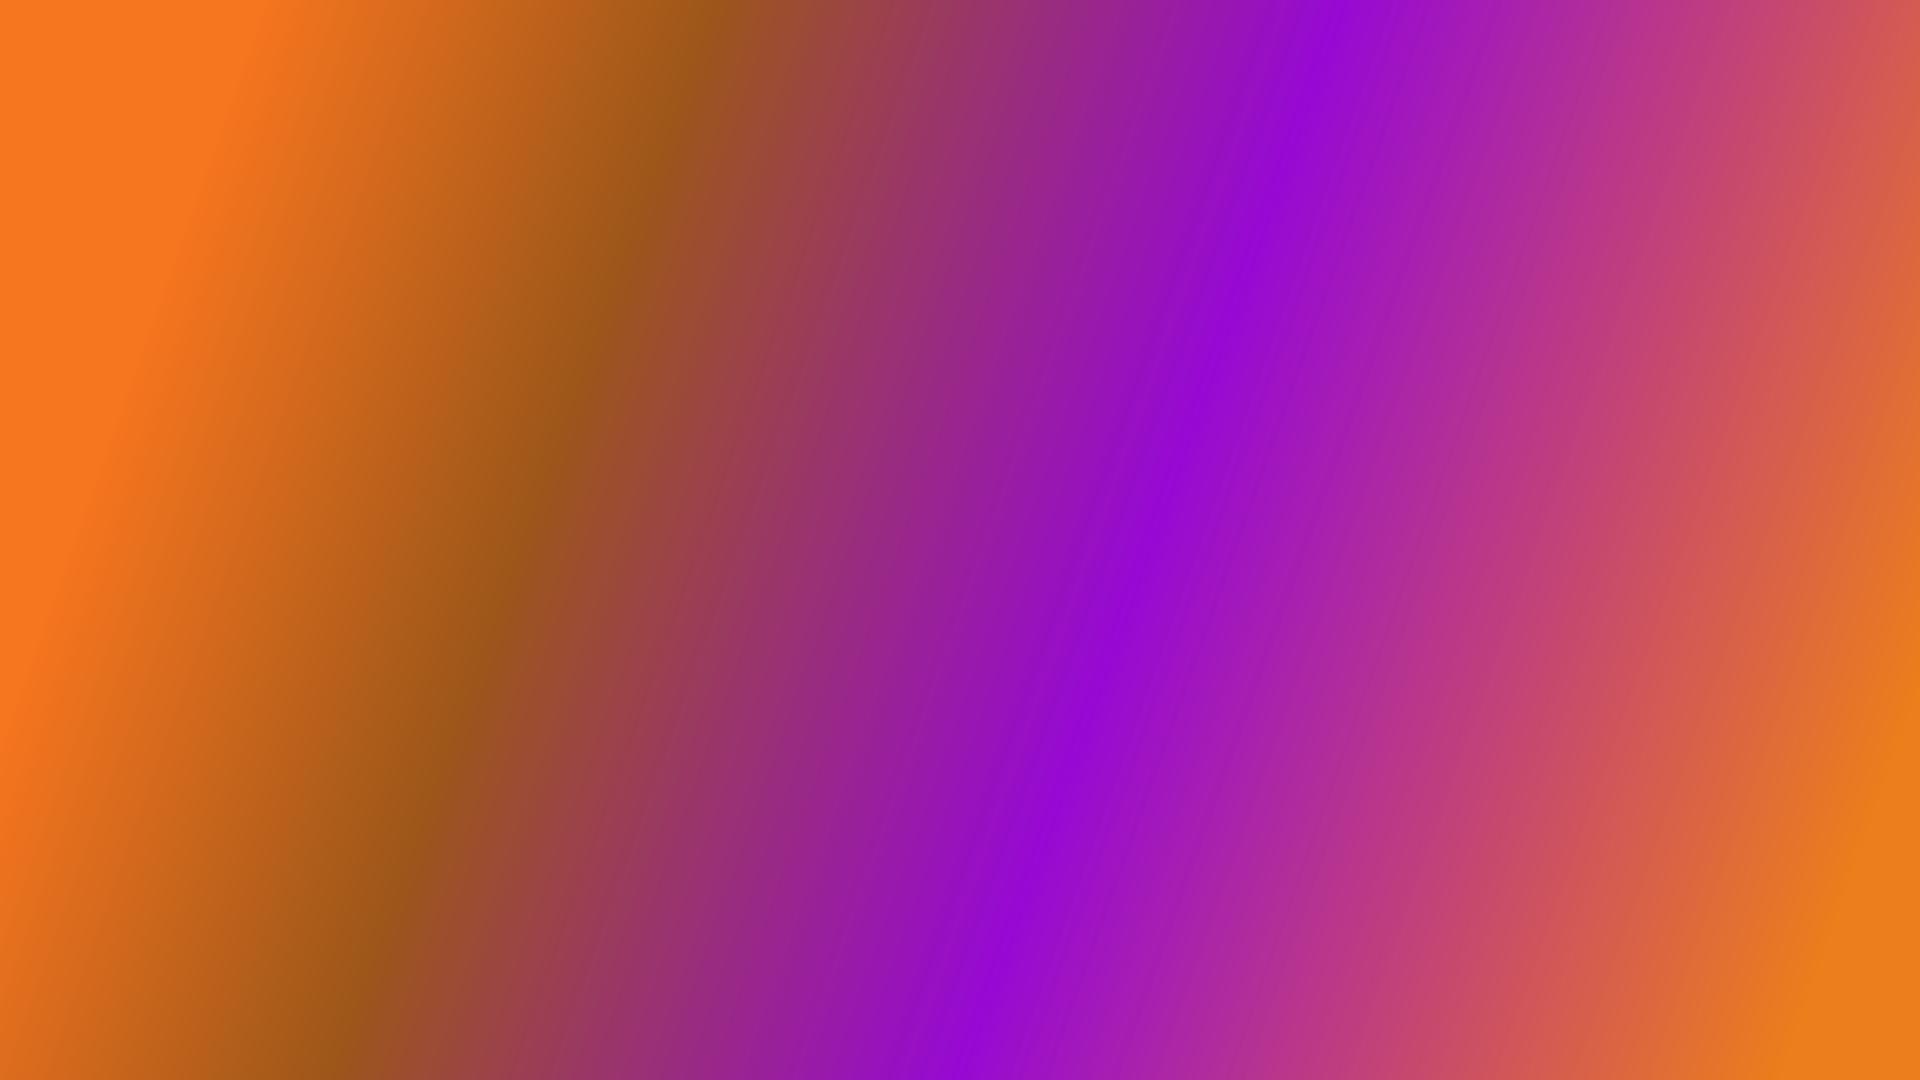 Orange and purple Gradient